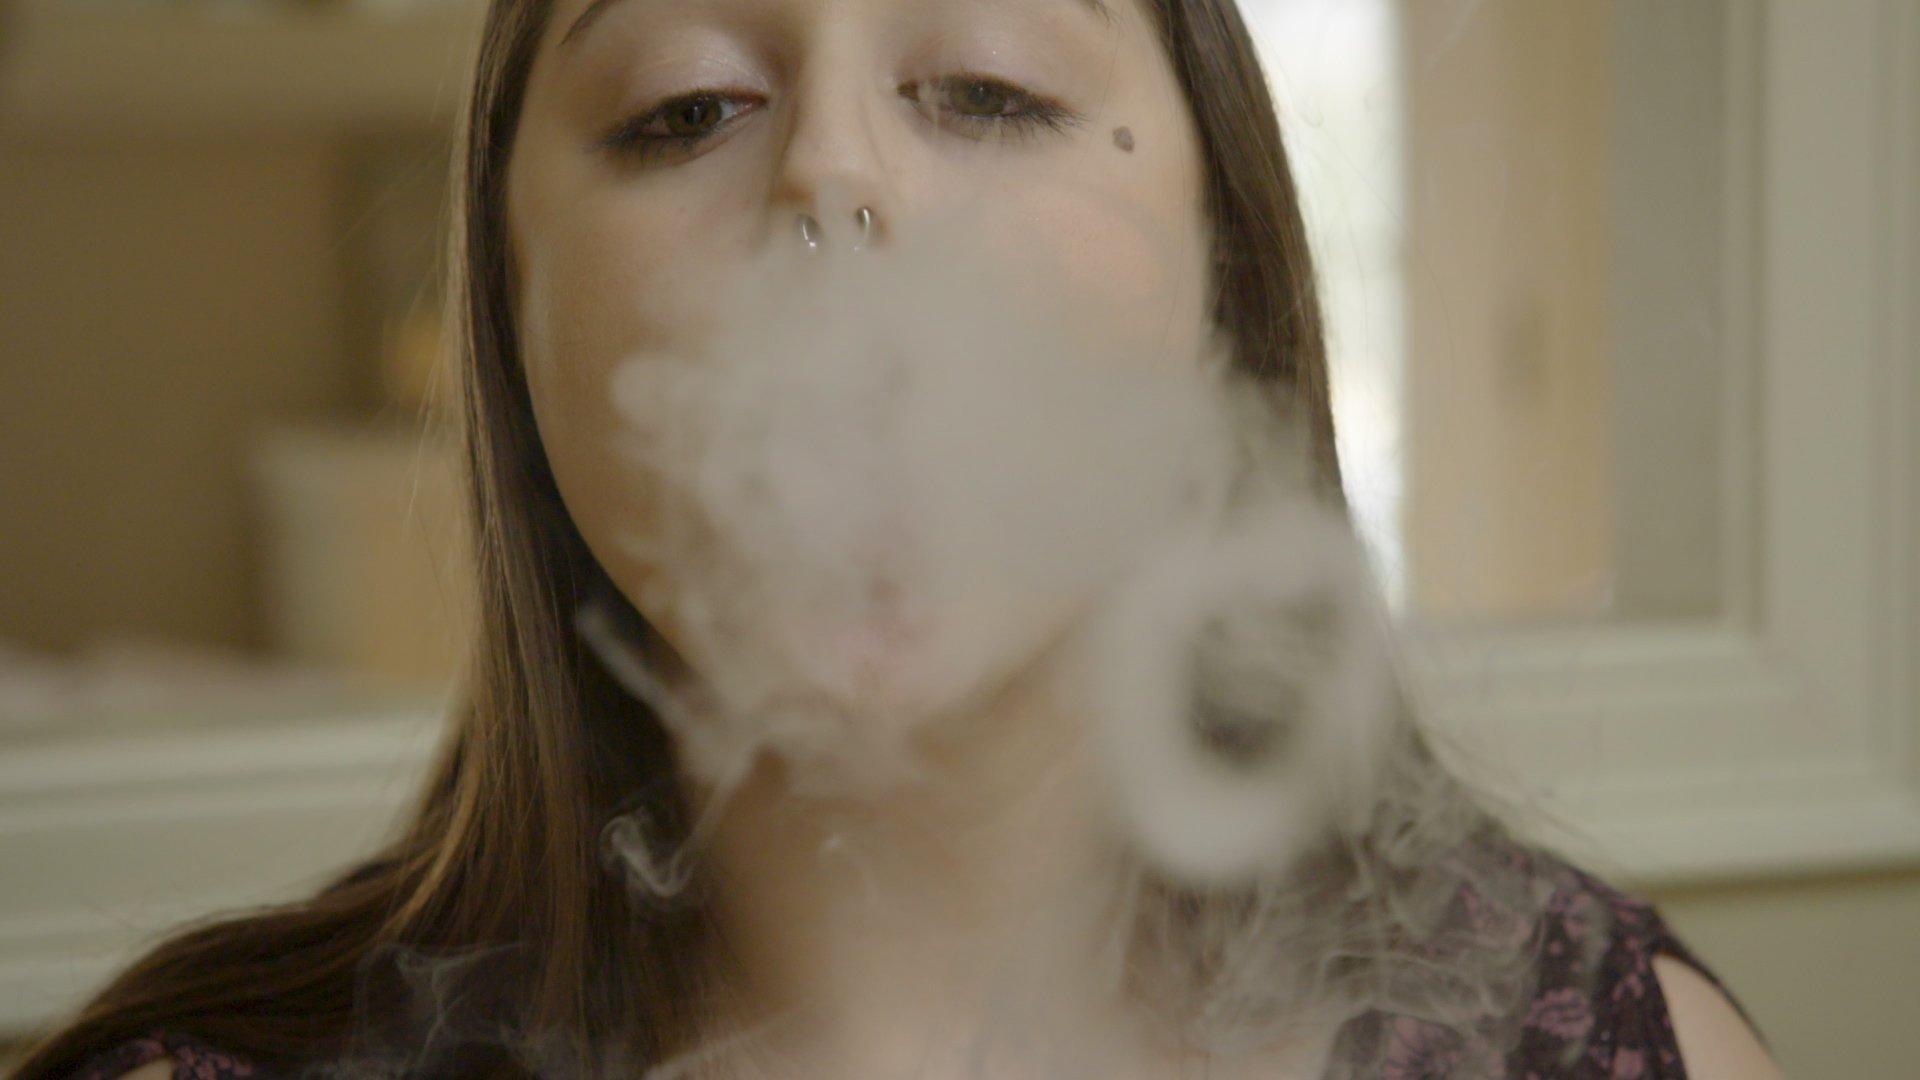 A teenage girl makes vapor circles while using an e-cigarette. (Credit: CNN)